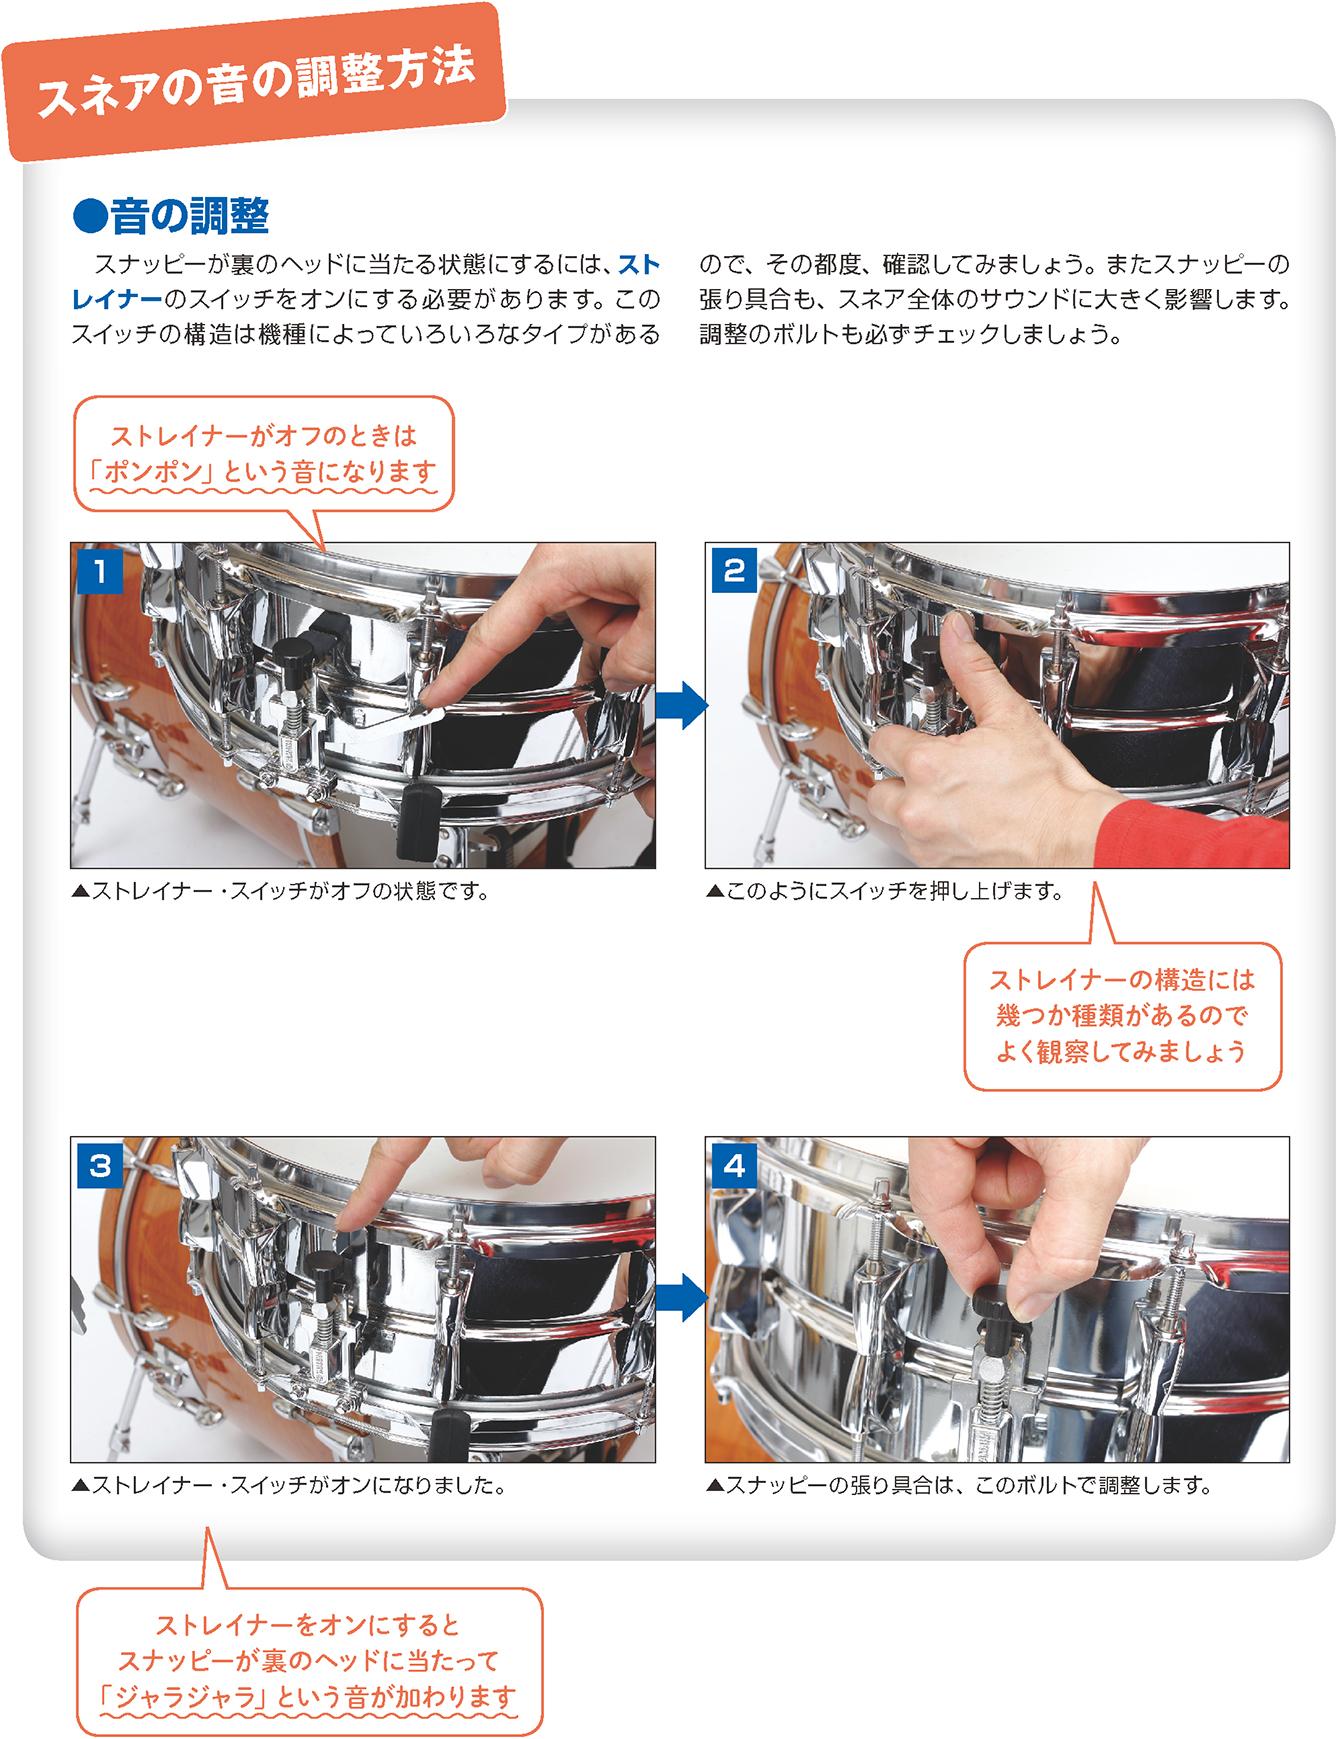 http://musicschool-navi.jp/columns/columns/assets_c/2017/keion02/keion_v2_drum_02.jpg